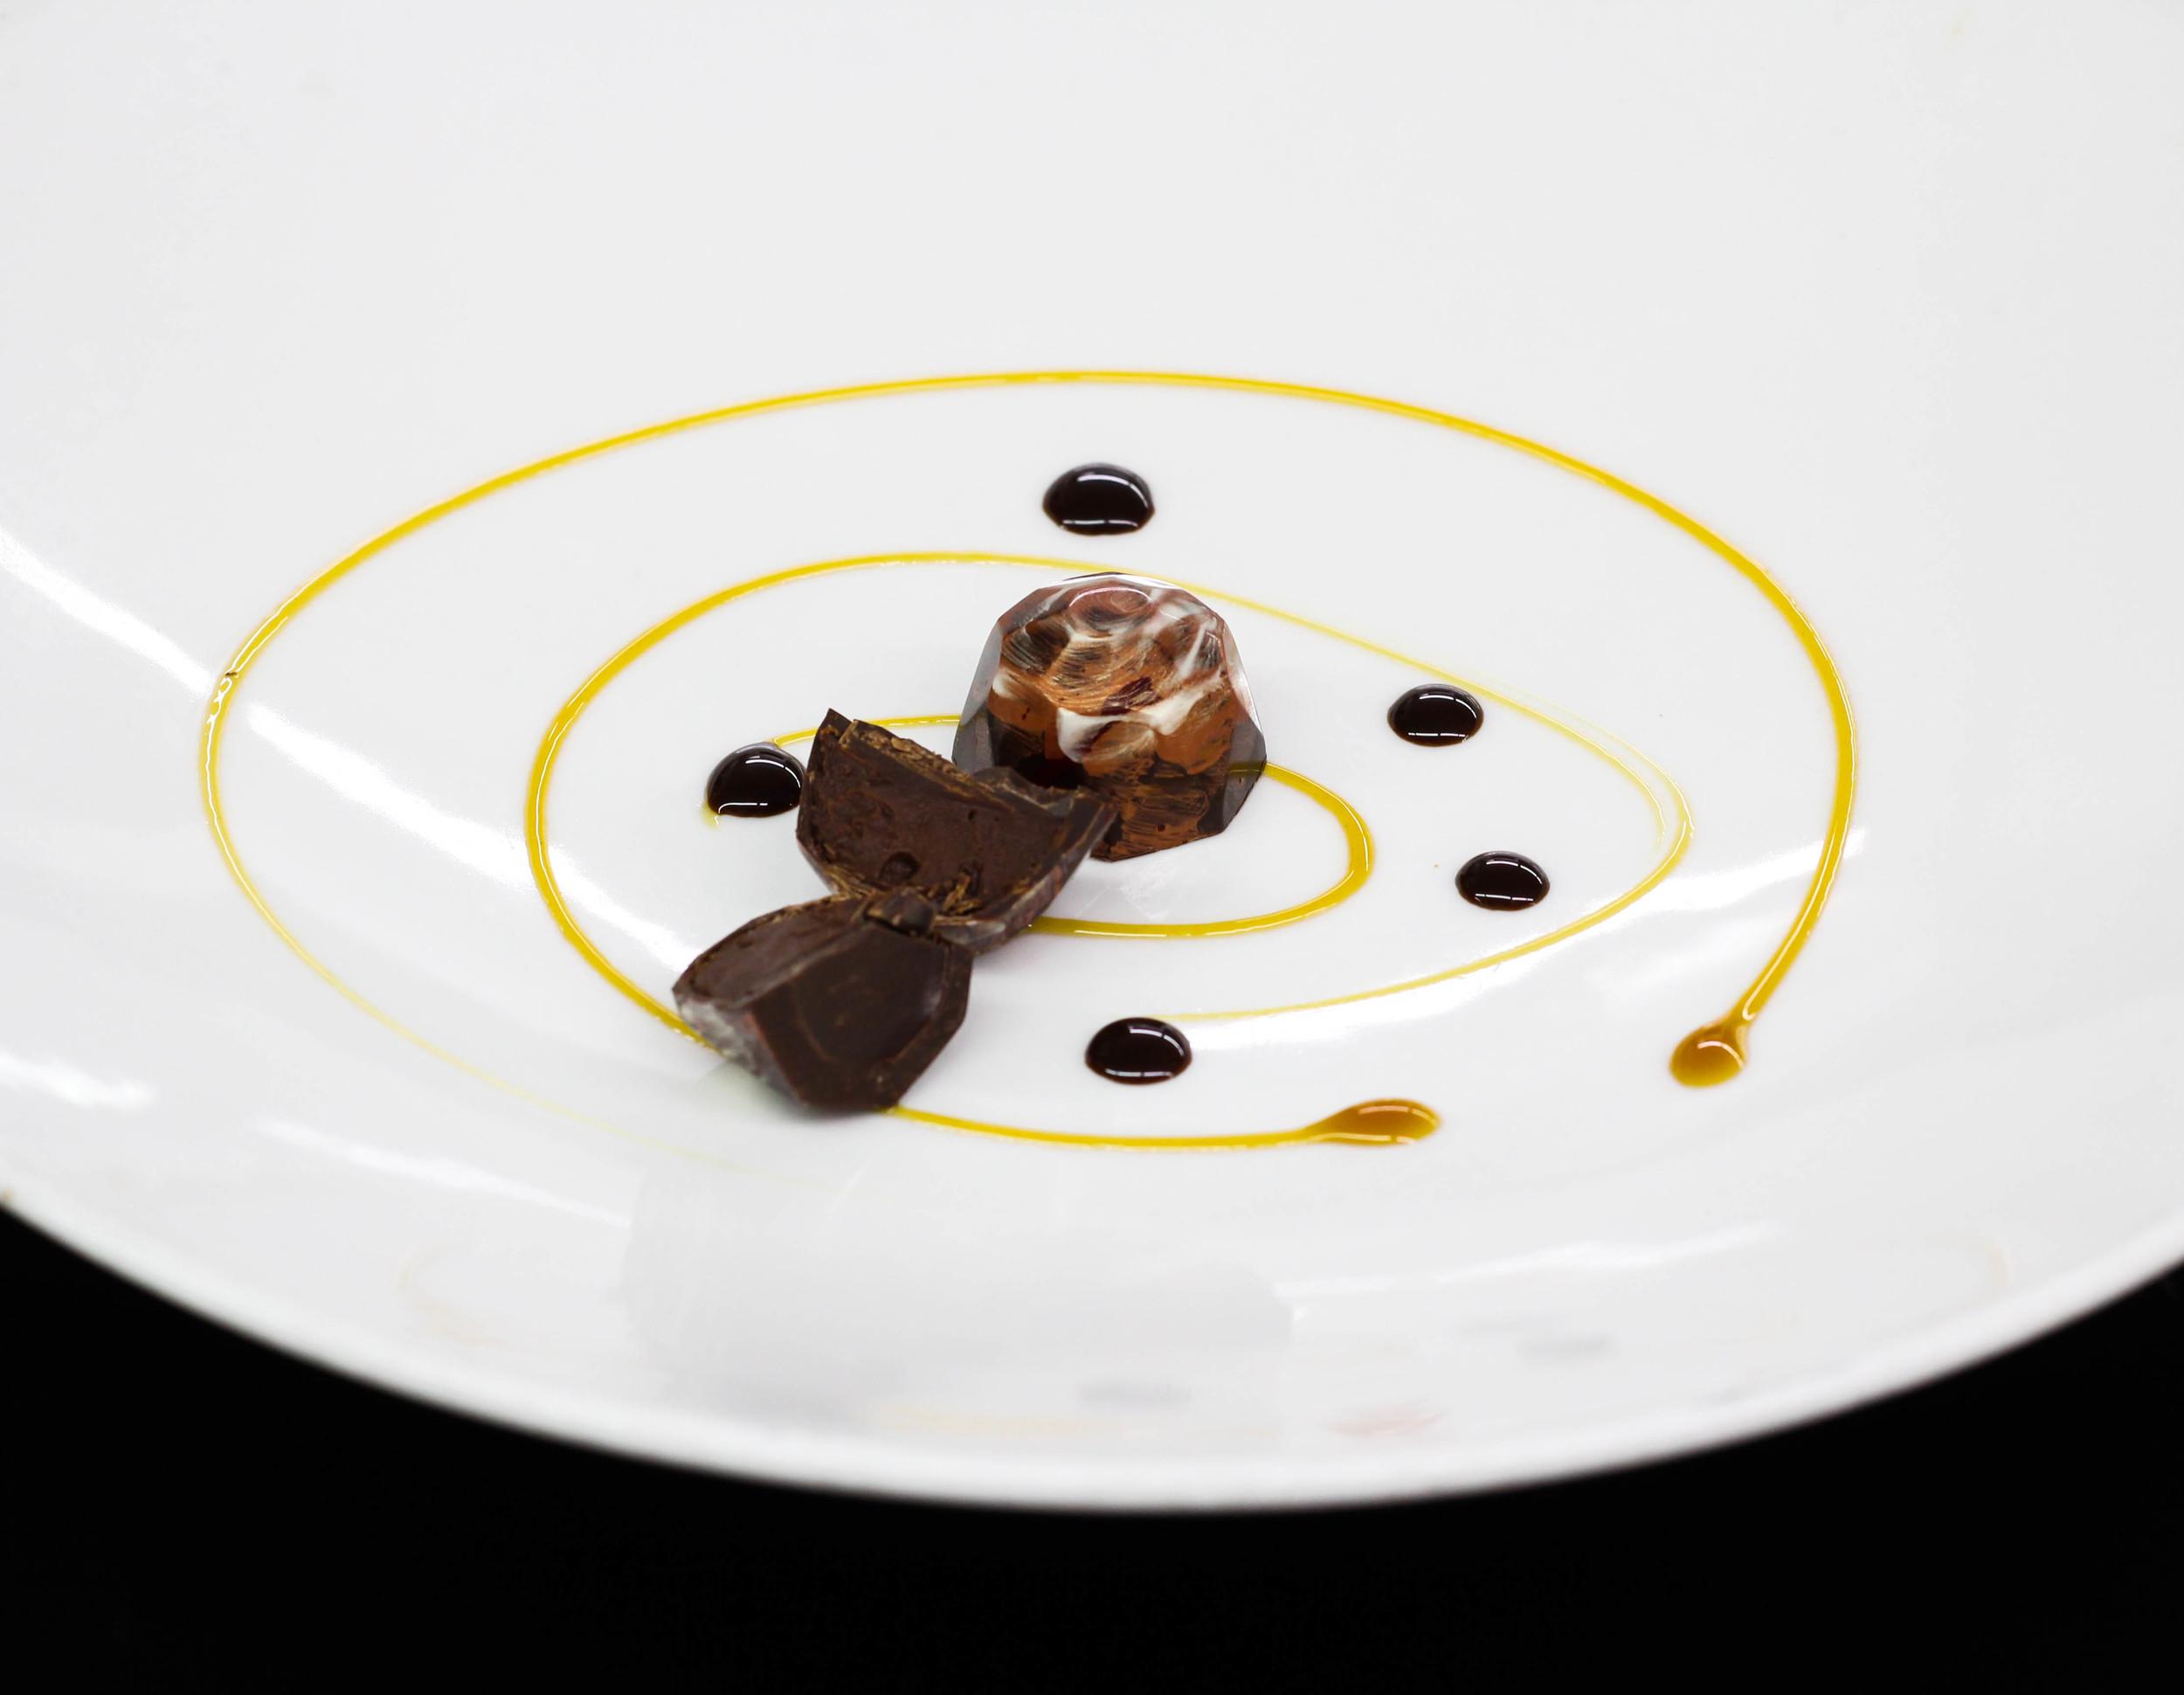 Creme-de-la-cocoa-chocolates-st-augustine-northeast-florida-2.JPG